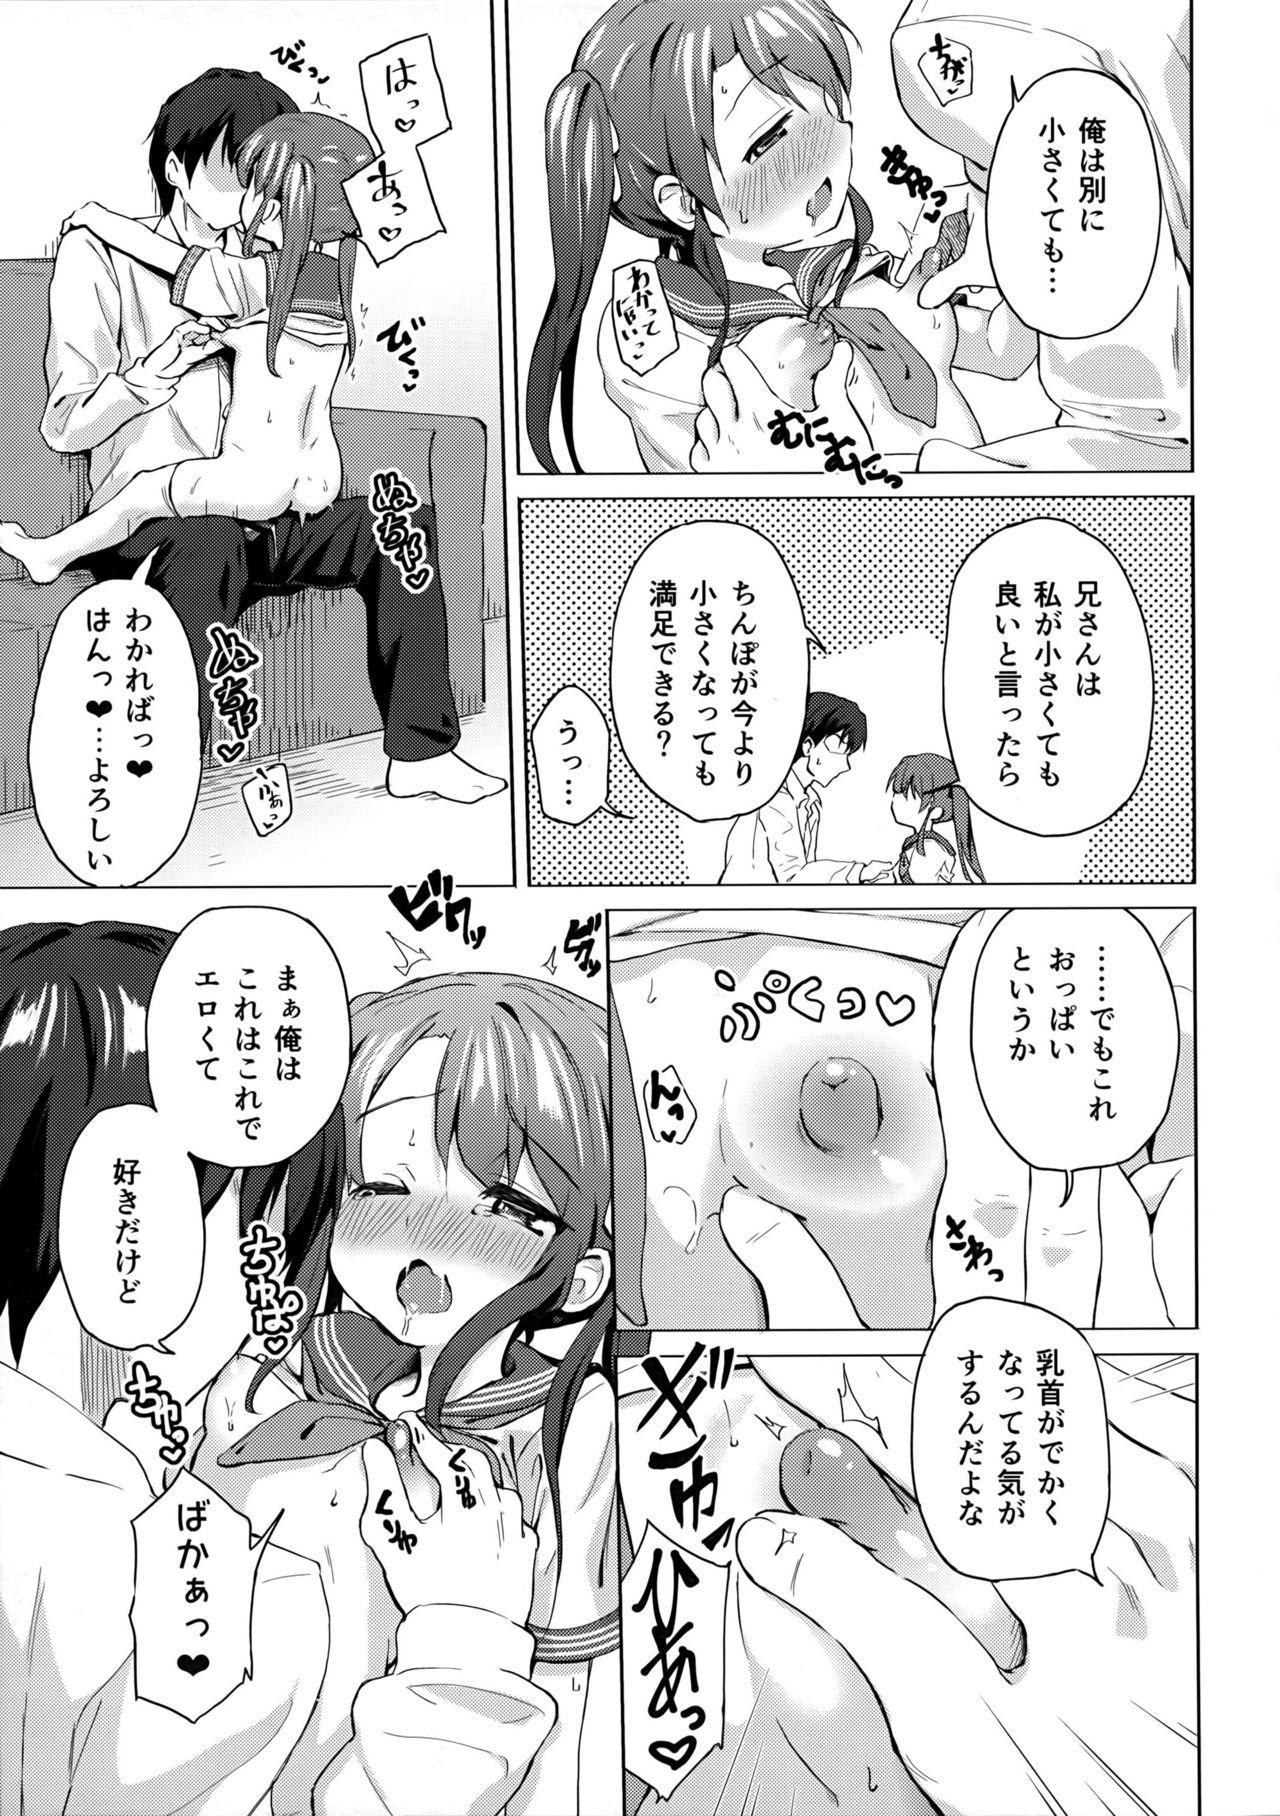 Imouto wa Ani Senyou 9